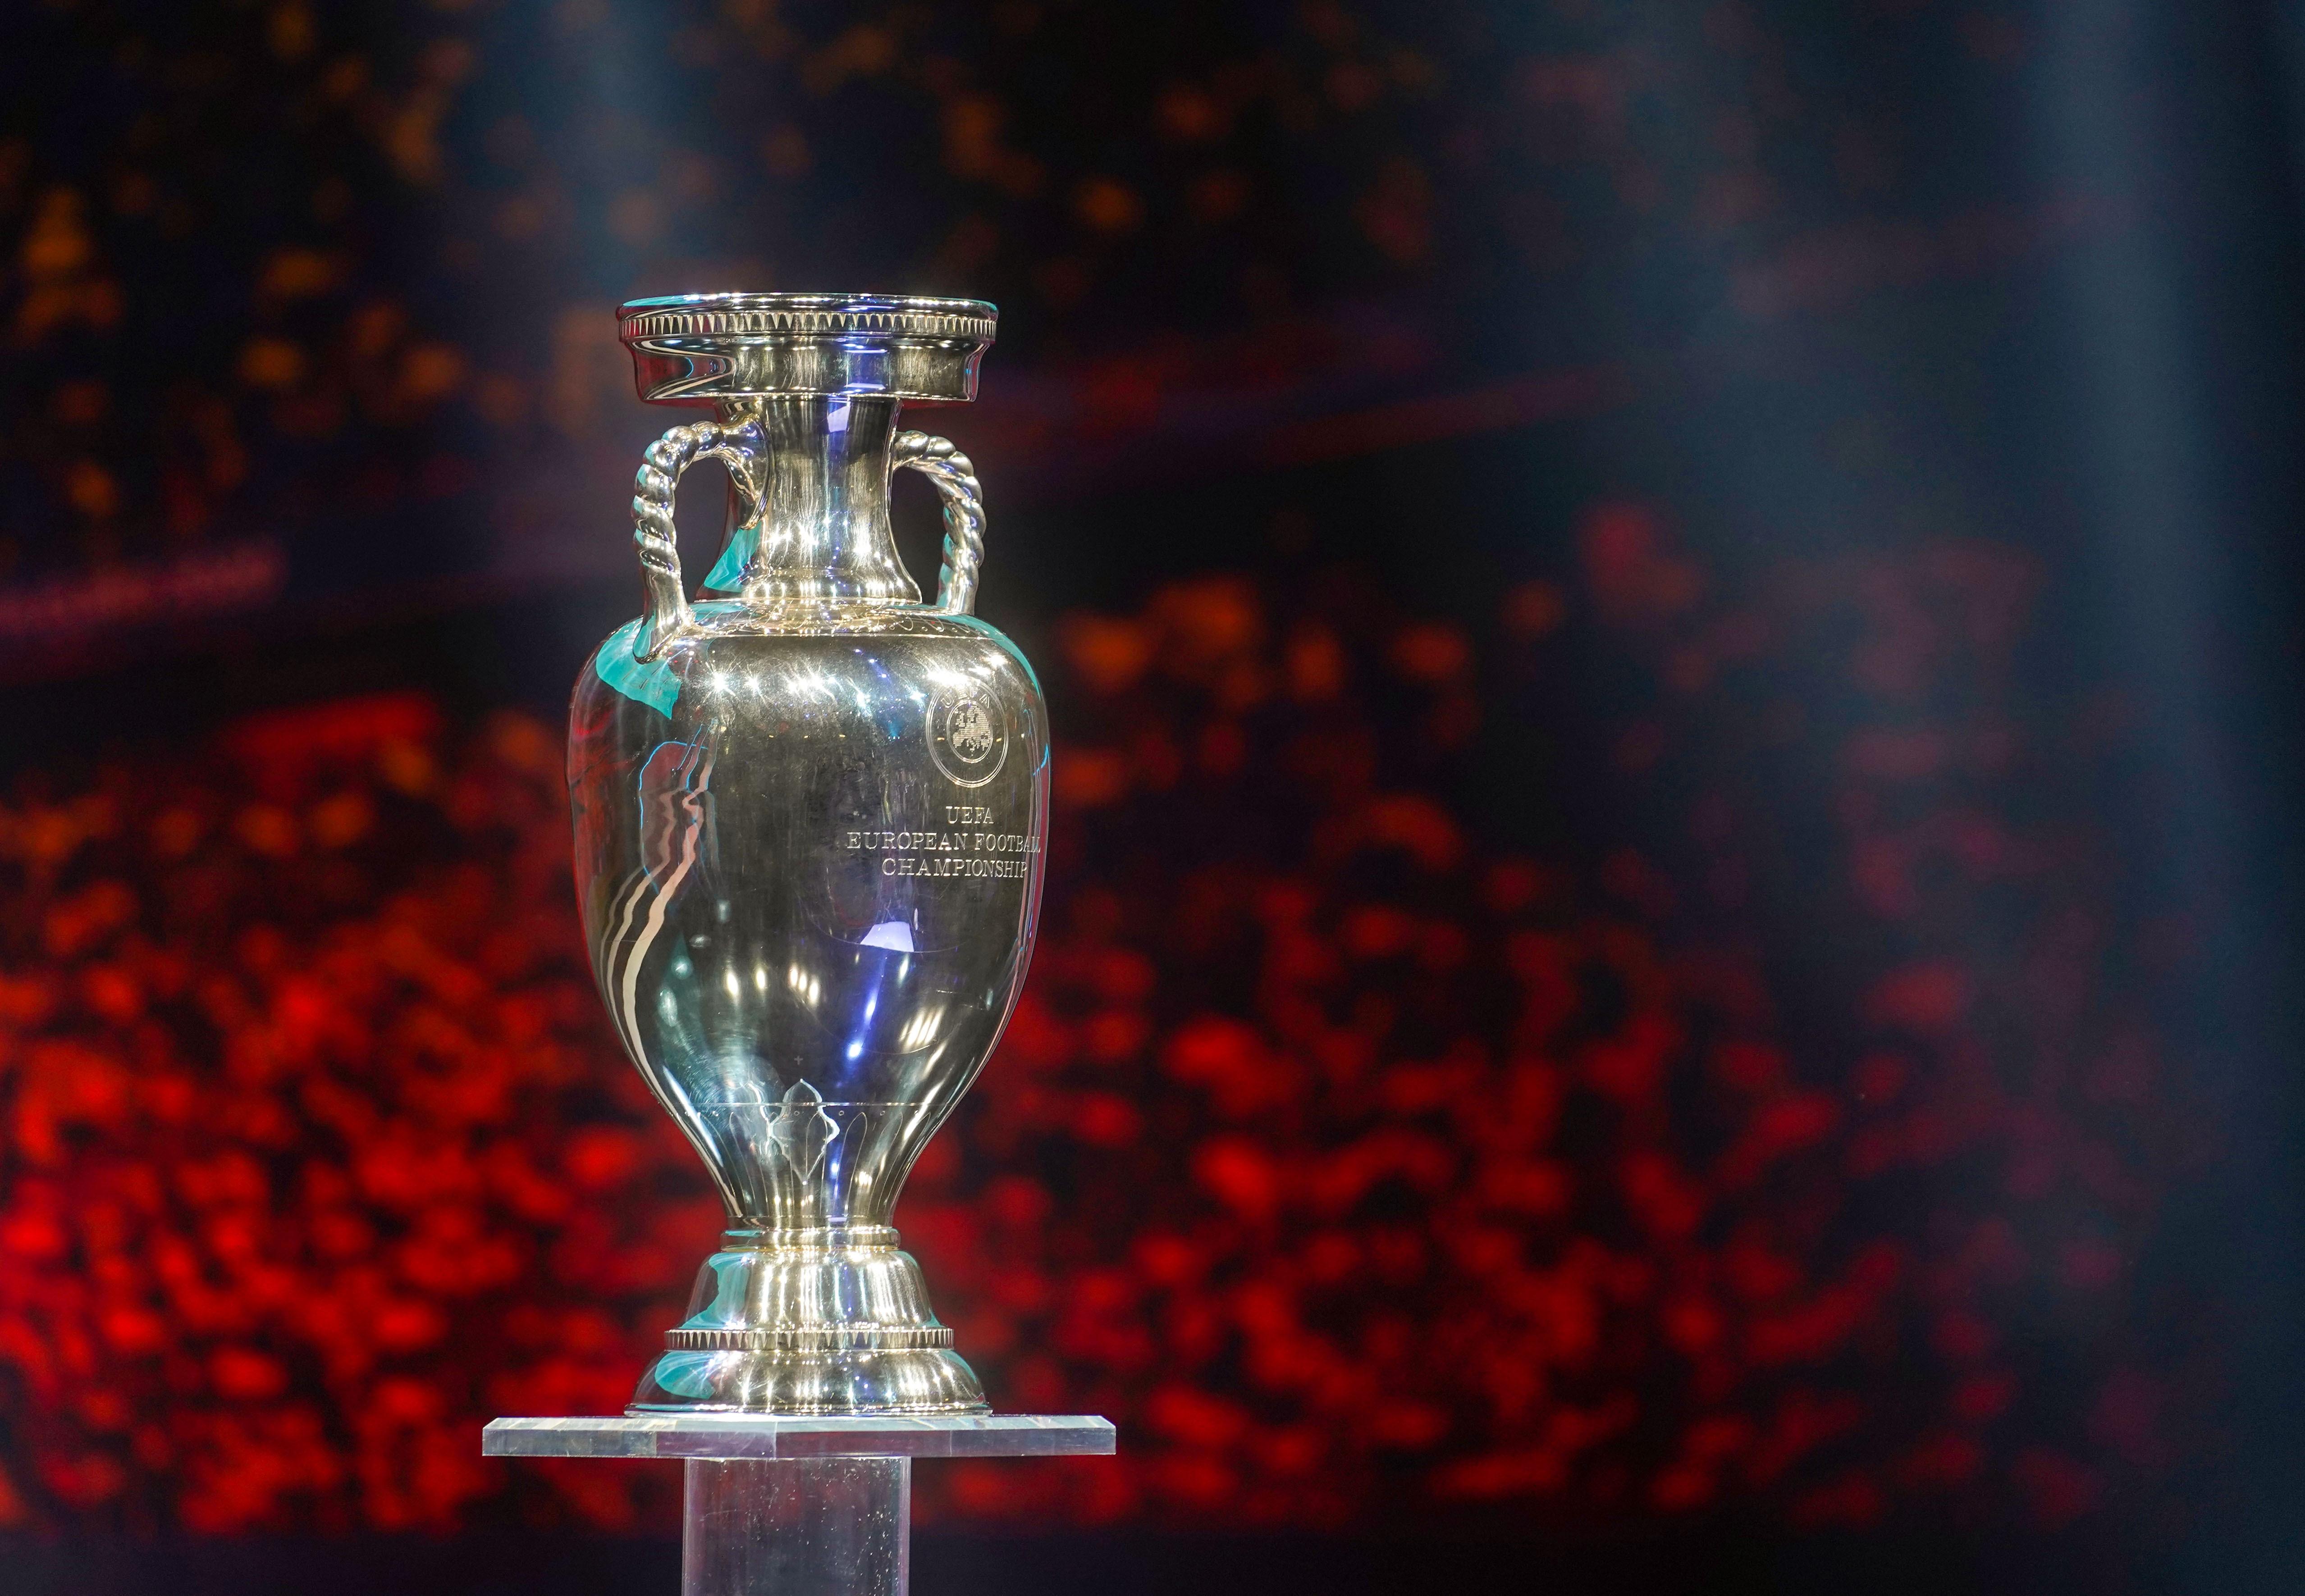 https://i.eurosport.com/2020/03/12/2793669.jpg